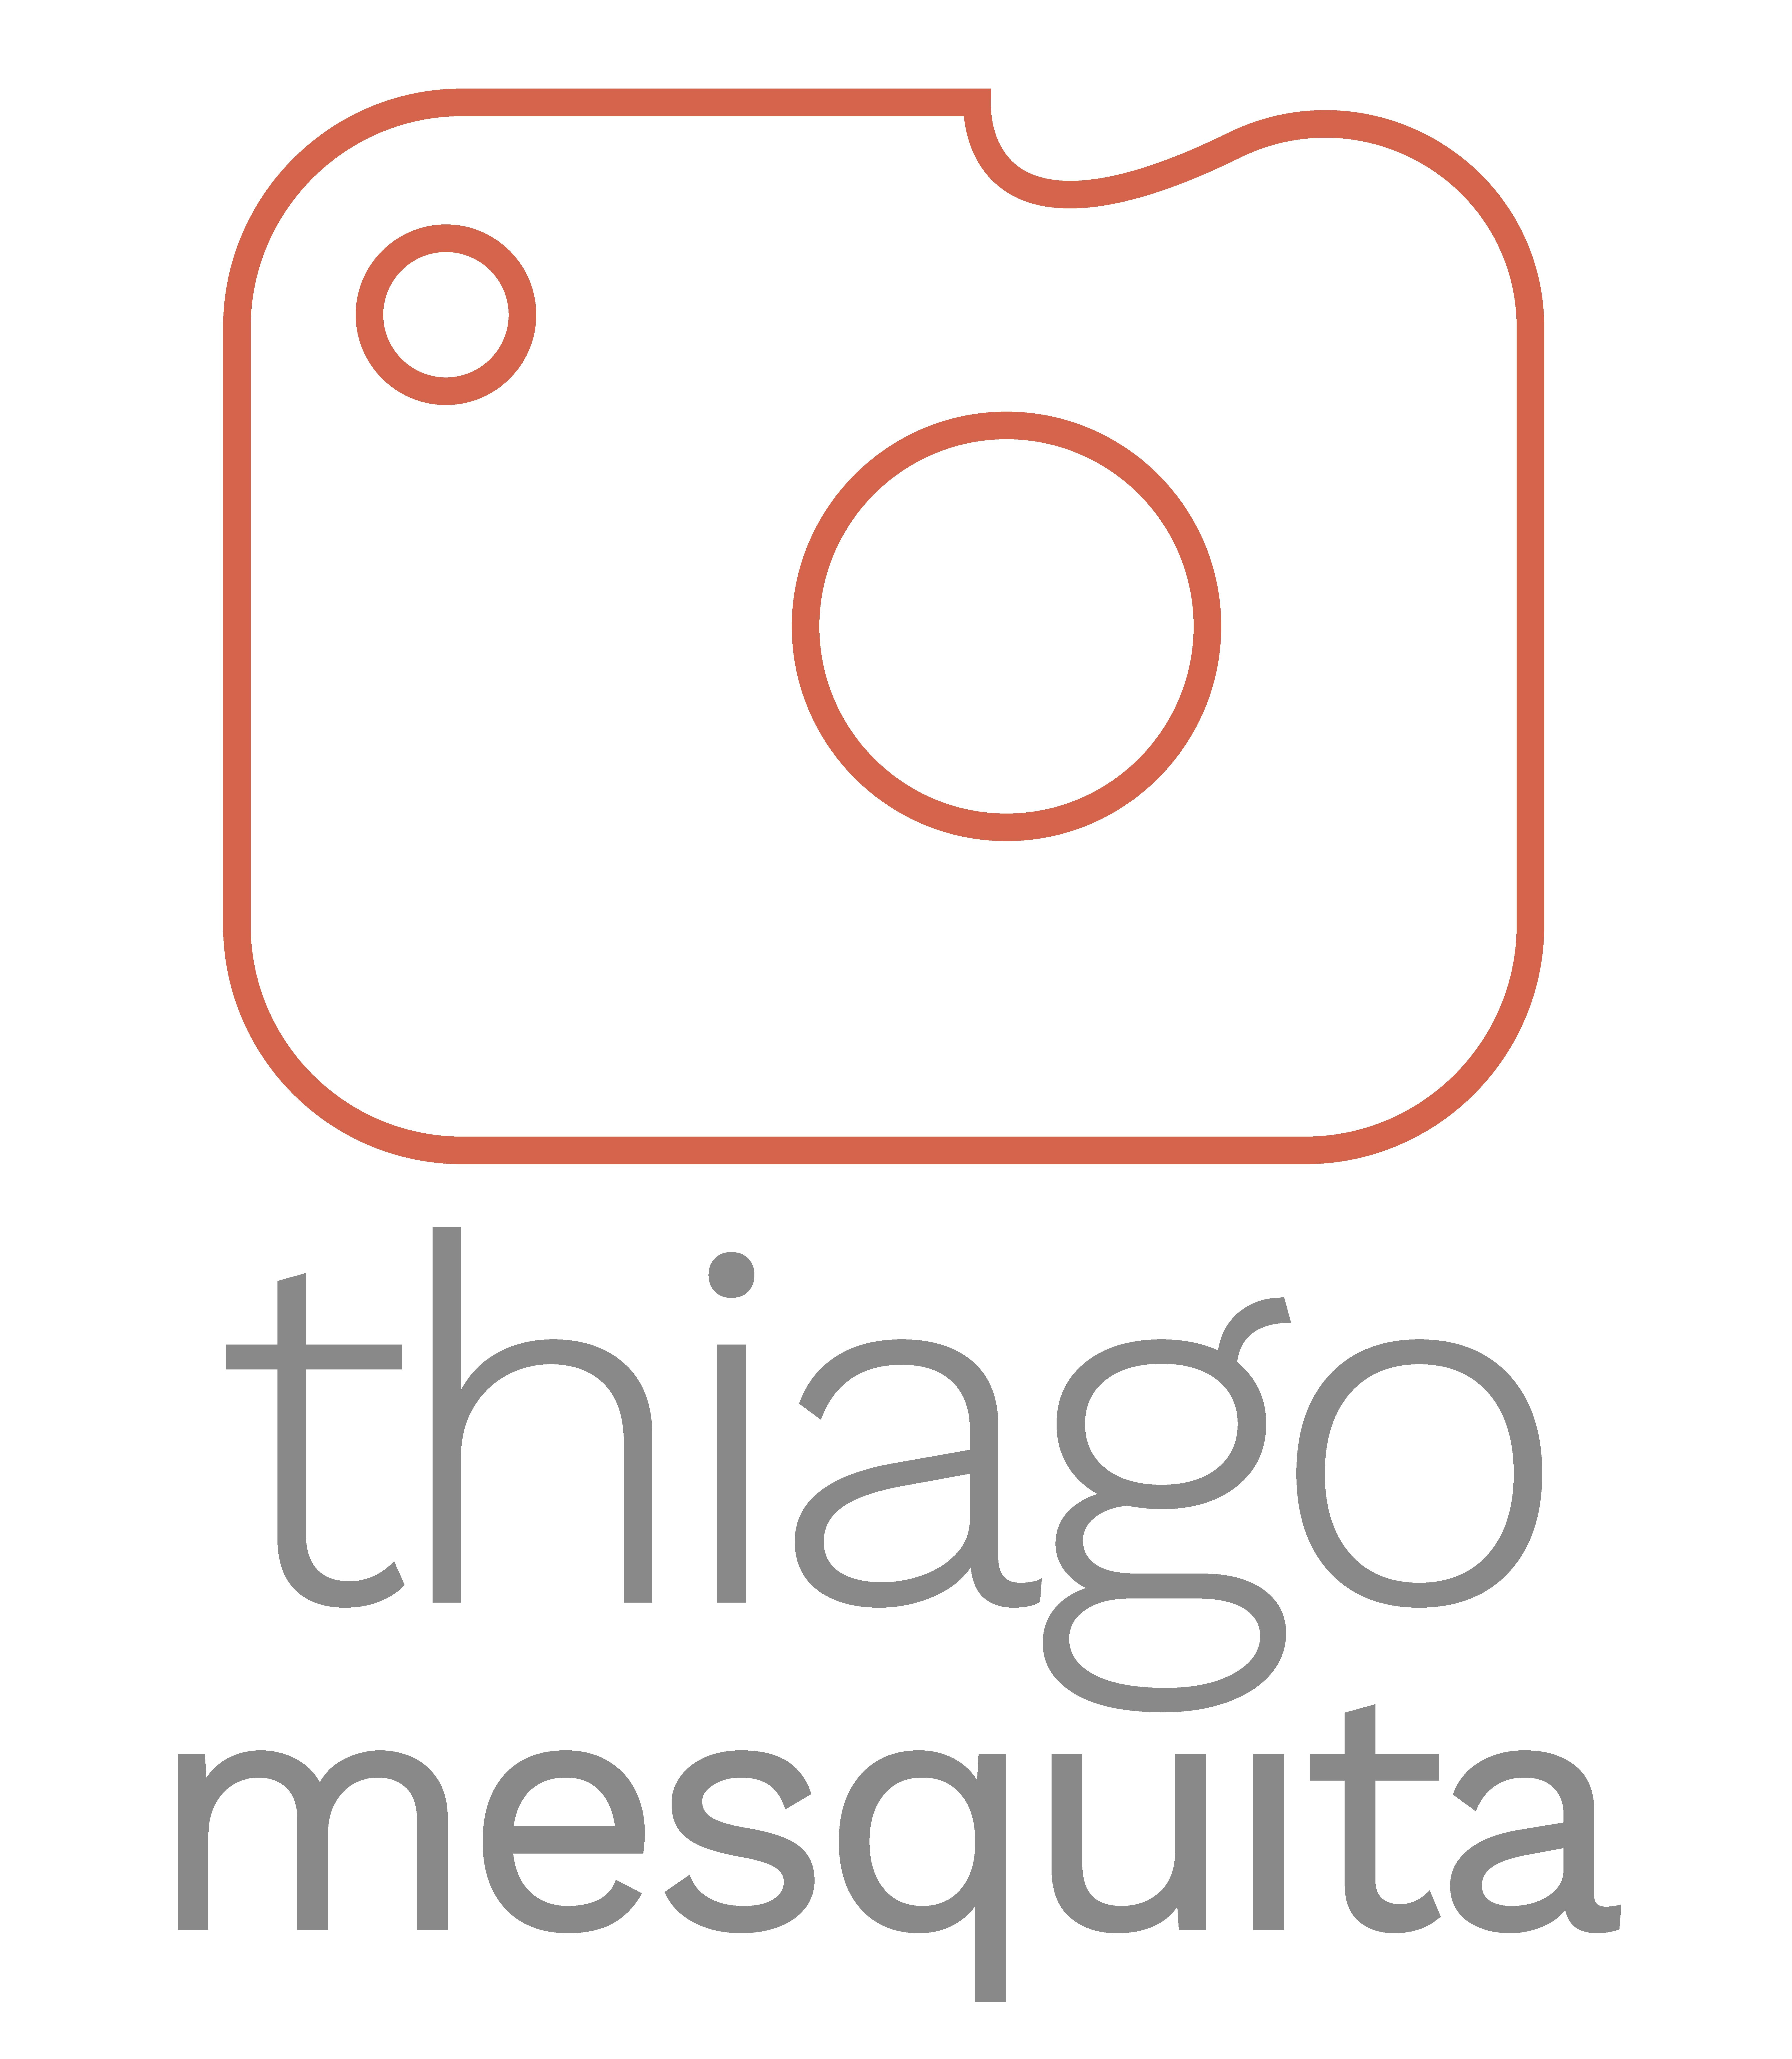 Contate Thiago Mesquita Fotografia